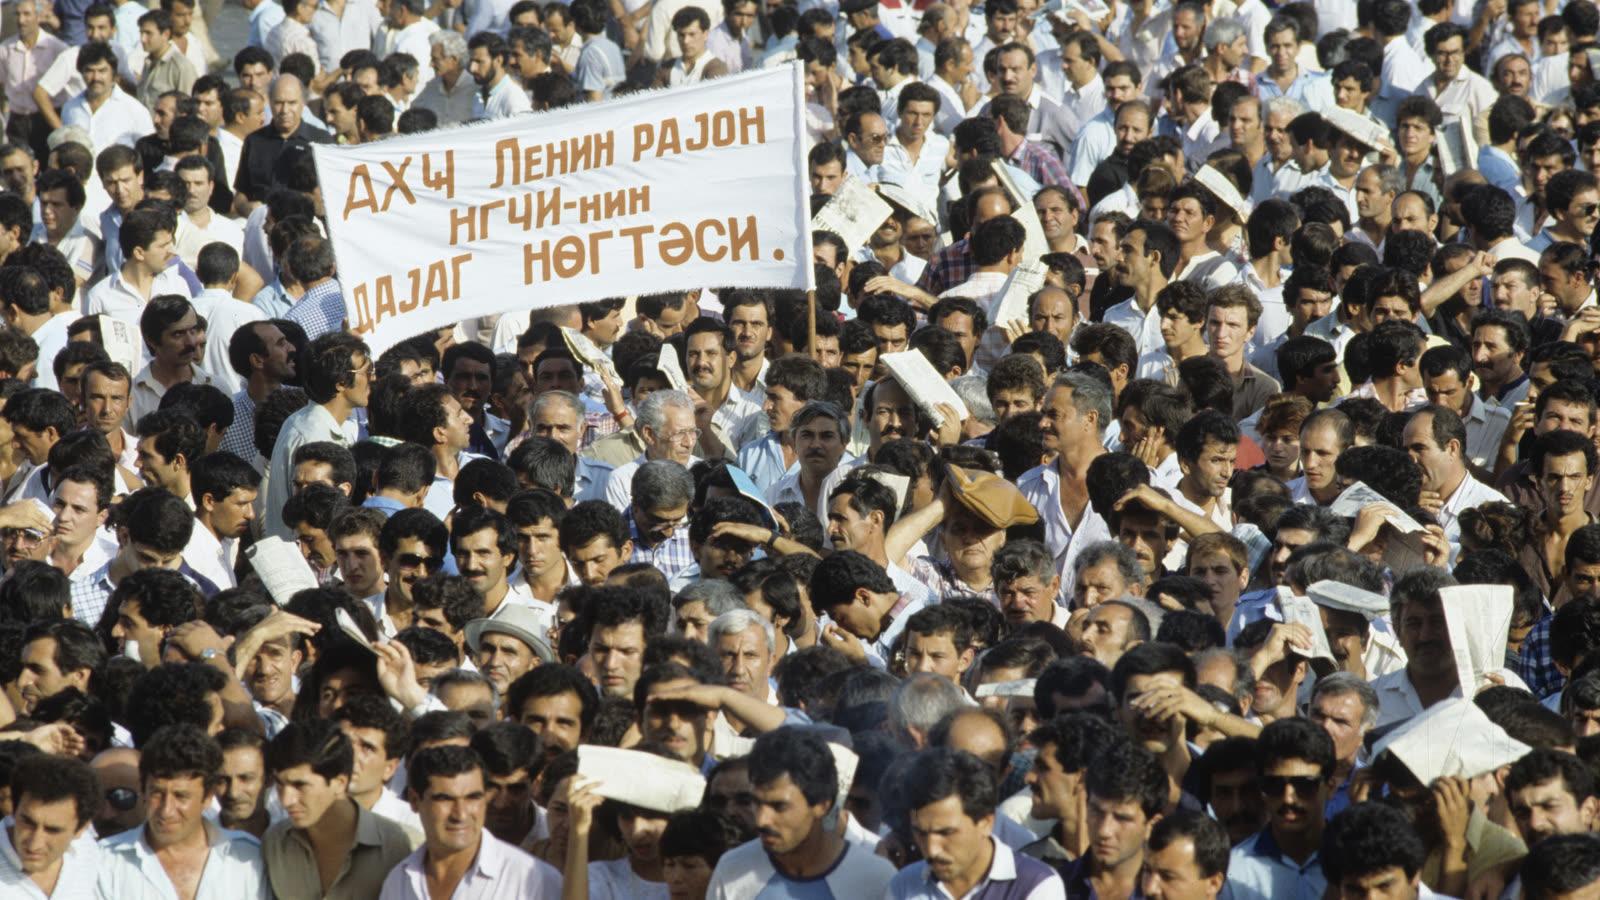 RIAN_00436182.HR.ru.jpg